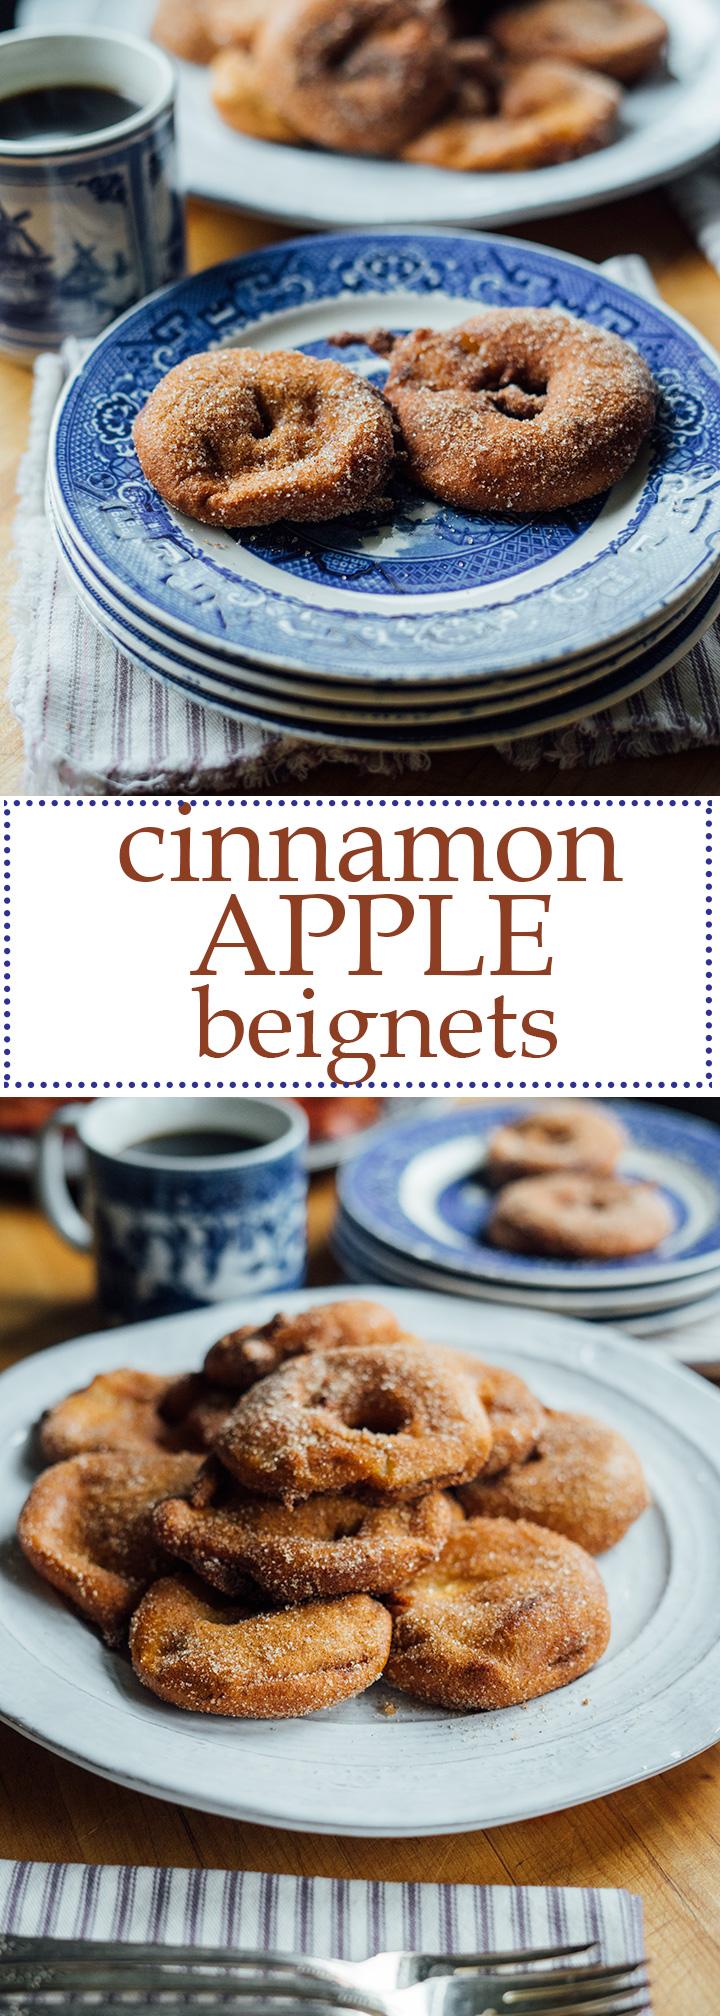 Cinnamon Apple Beignets   www.thetableofcontents.co